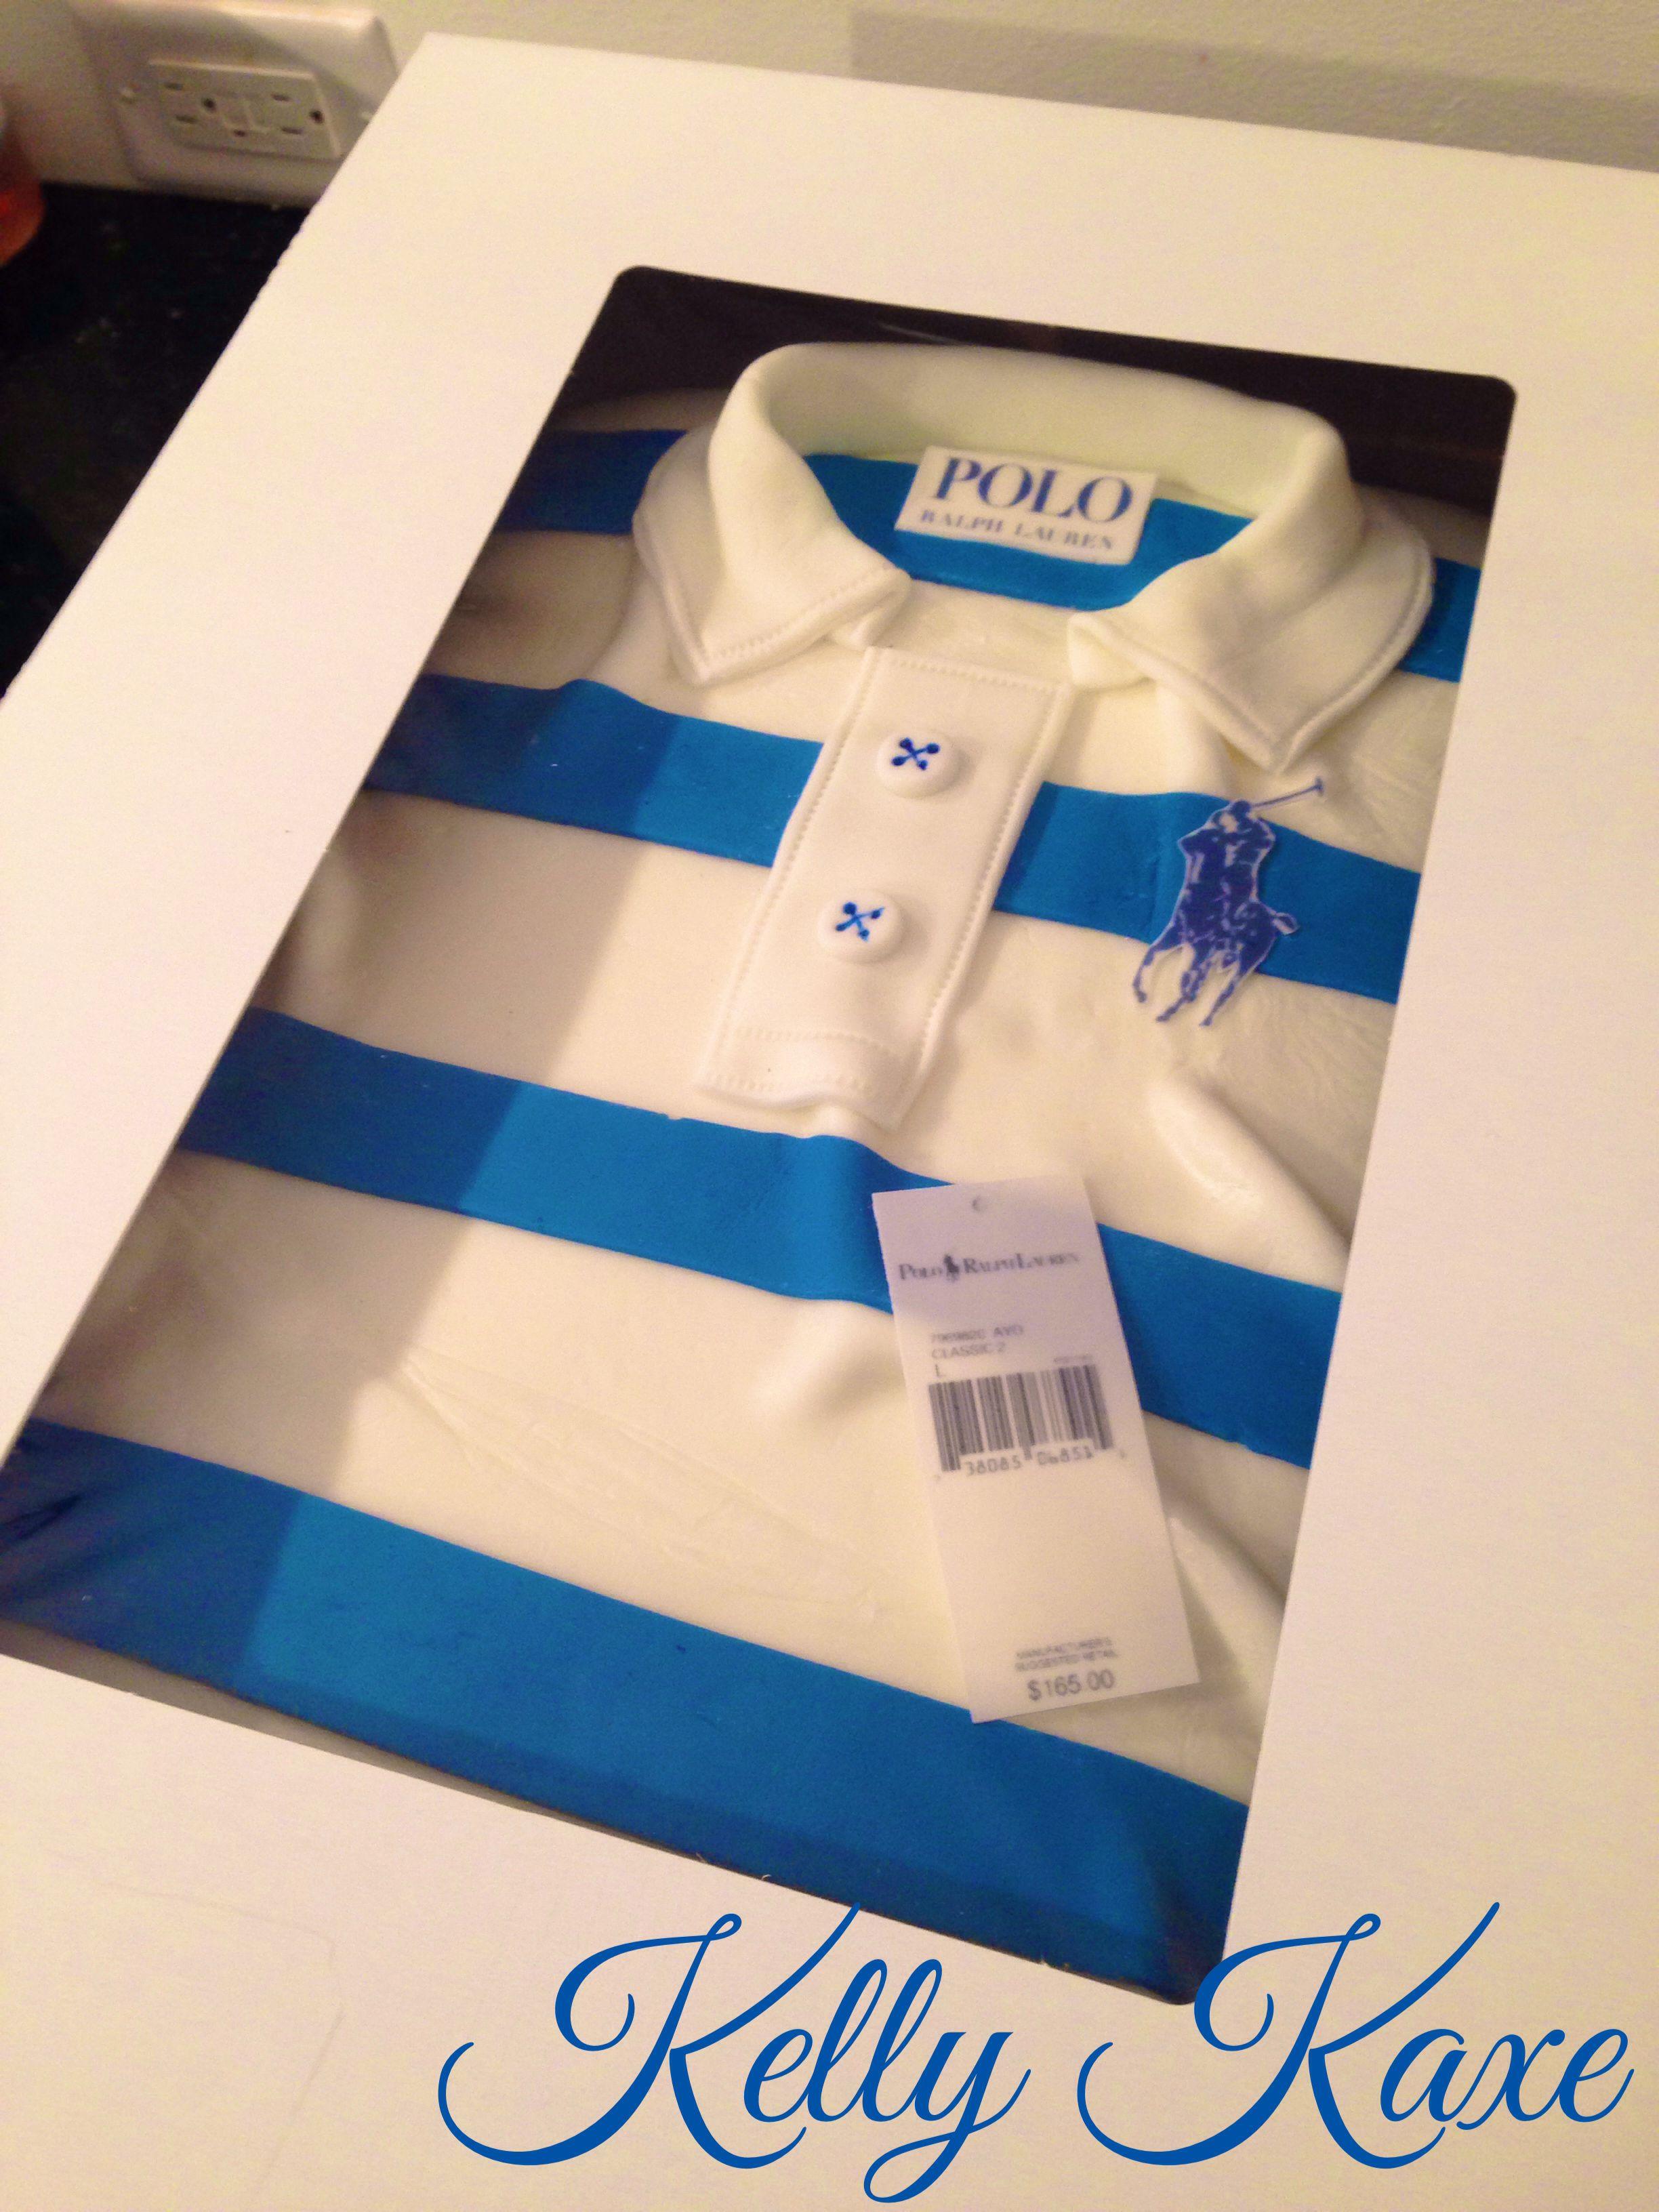 Polo Shirt Cake Polo Shirt Cake Pinterest Shirt Cake Cake And